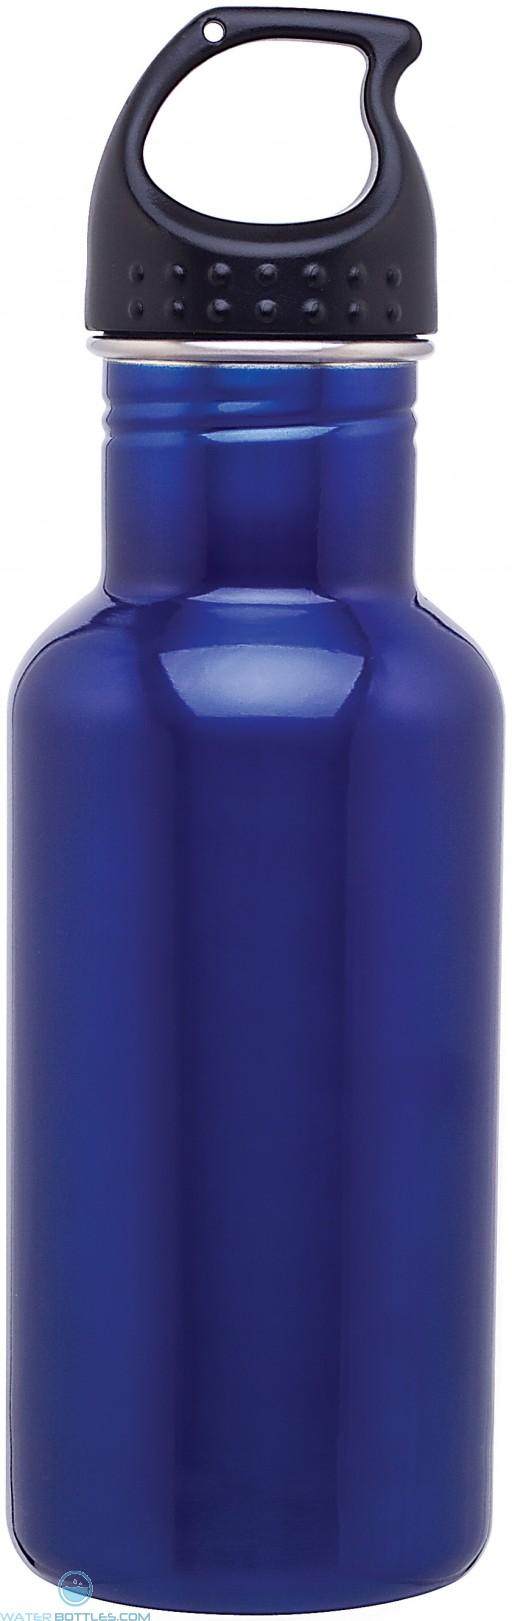 H2Go Stainless Steel Bolt   18 oz - Blue